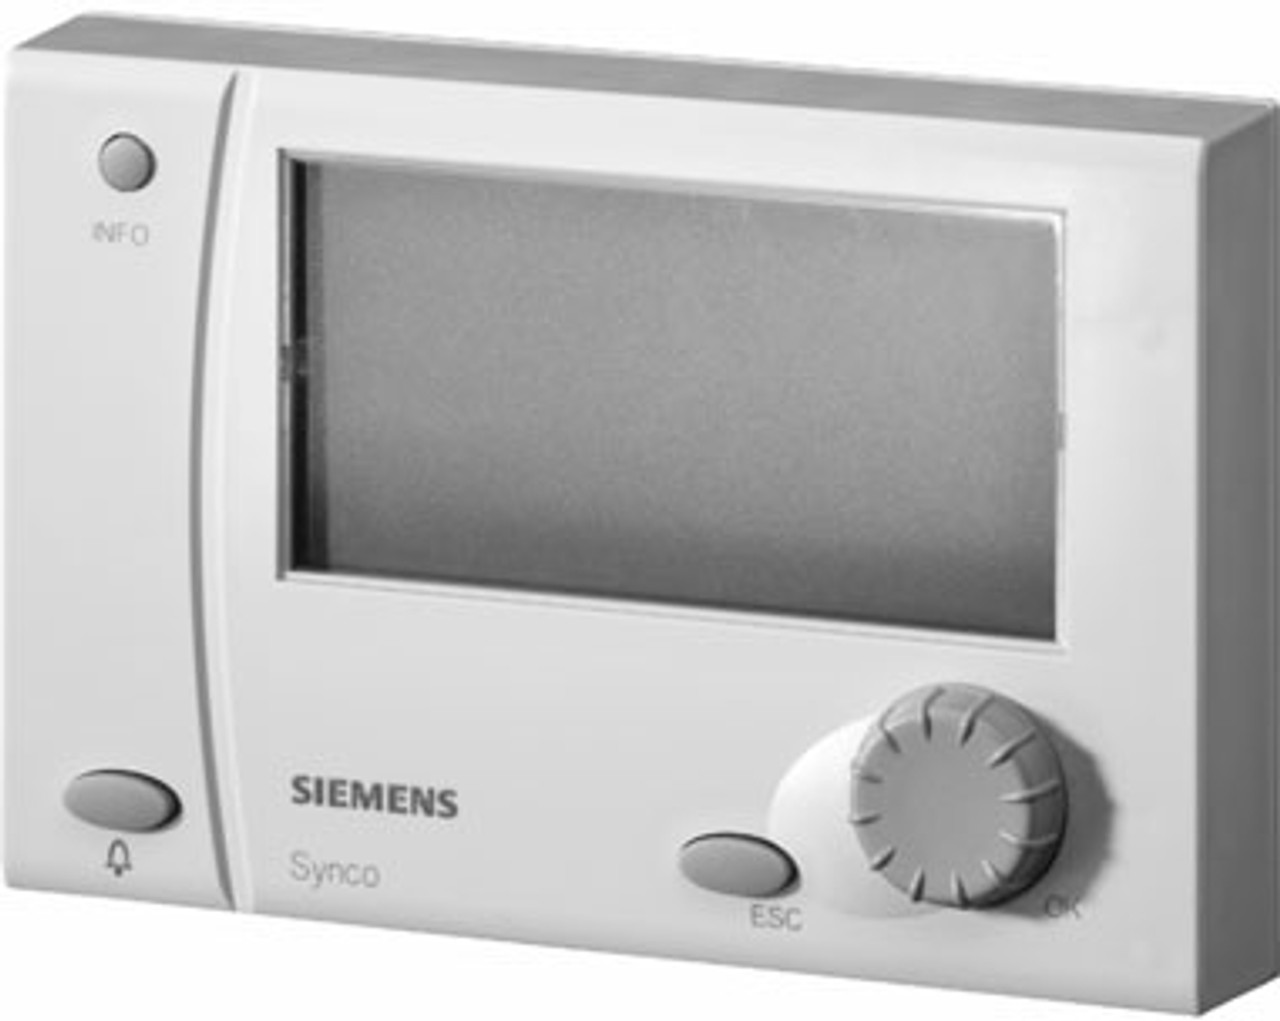 Siemens RMZ791 detached operator unit